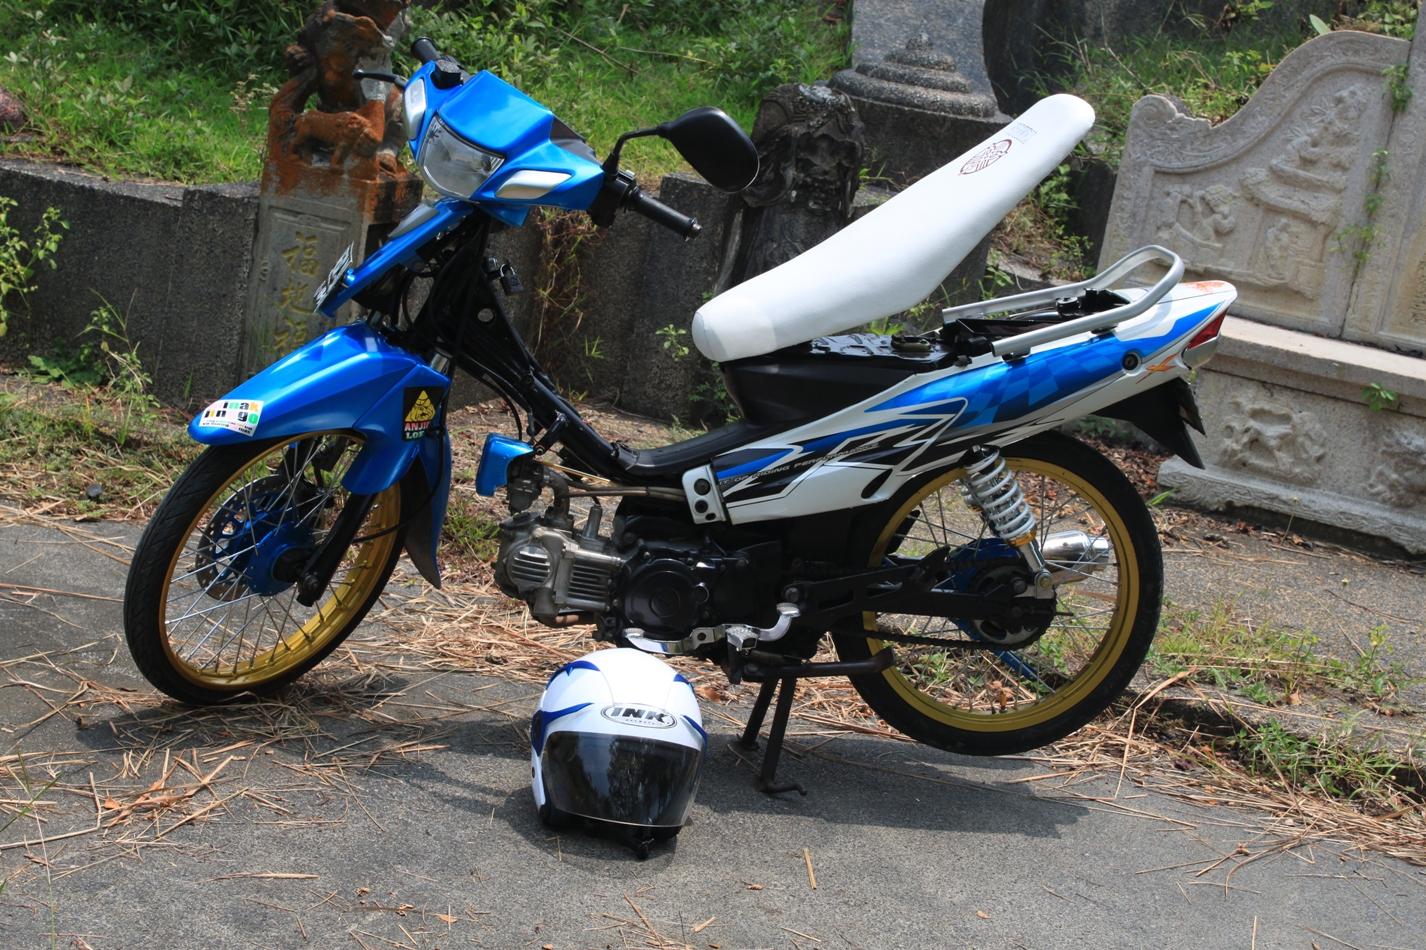 Modif Motor Yamaha Zr